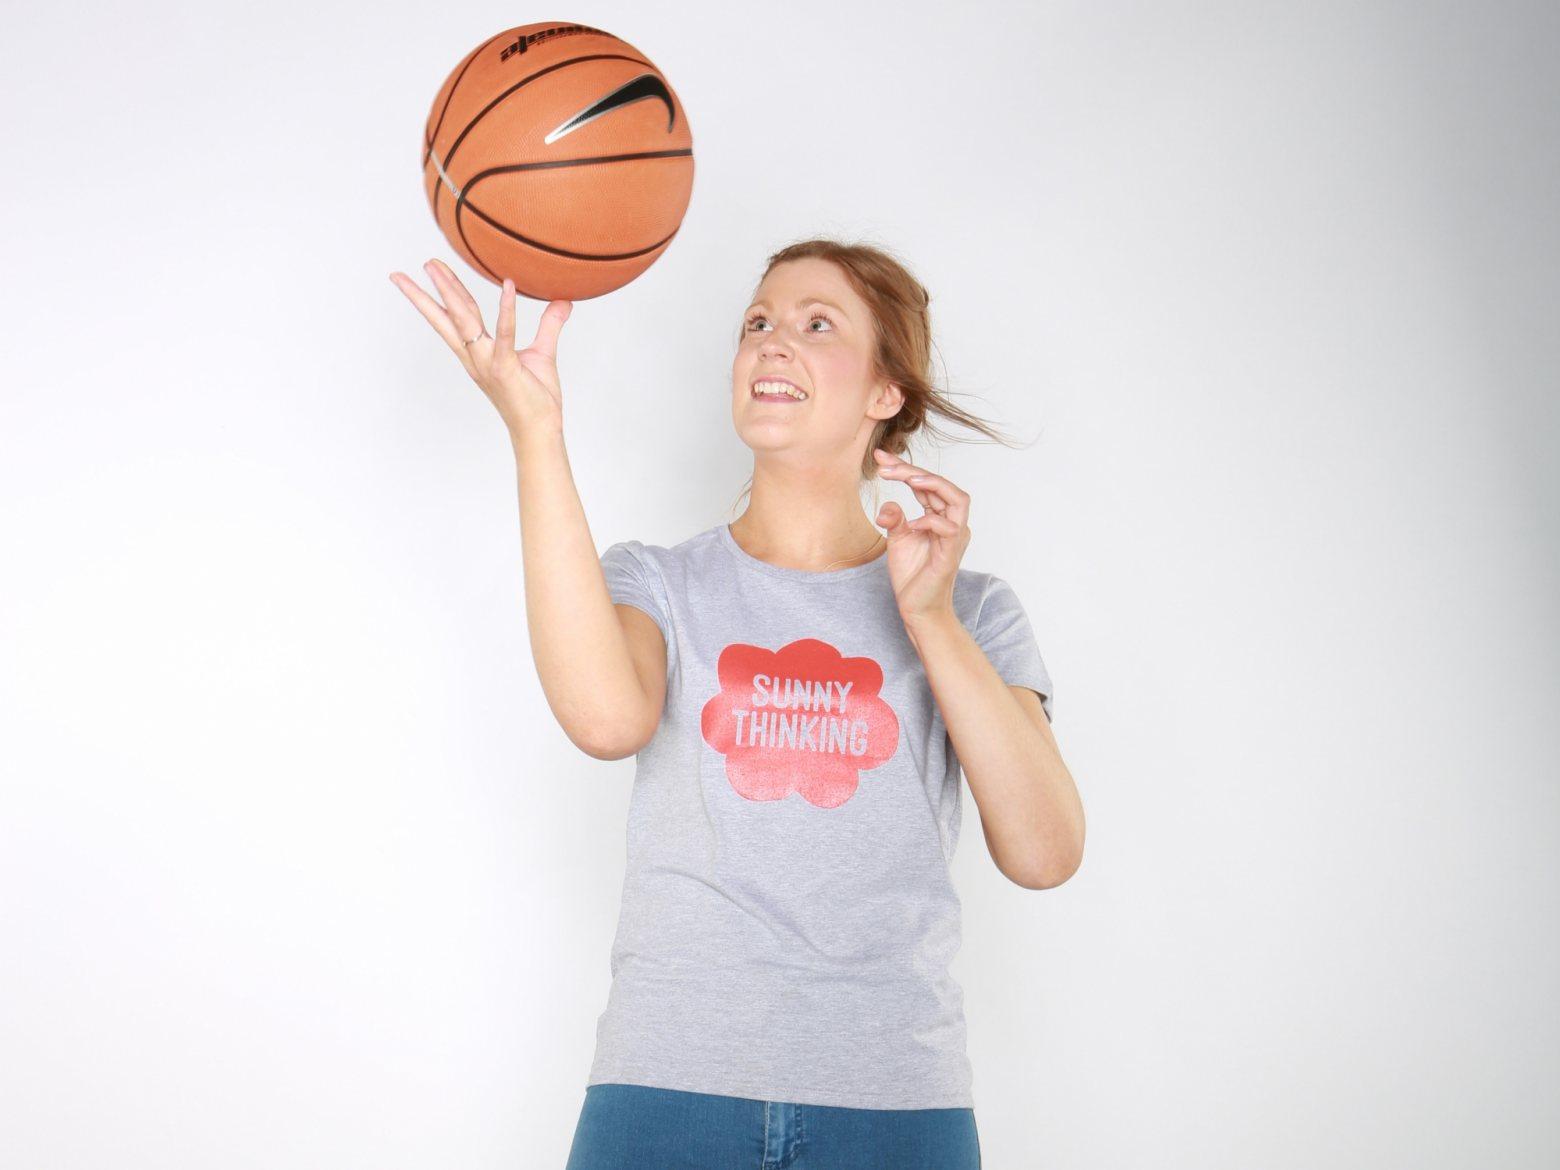 Kpbasketball